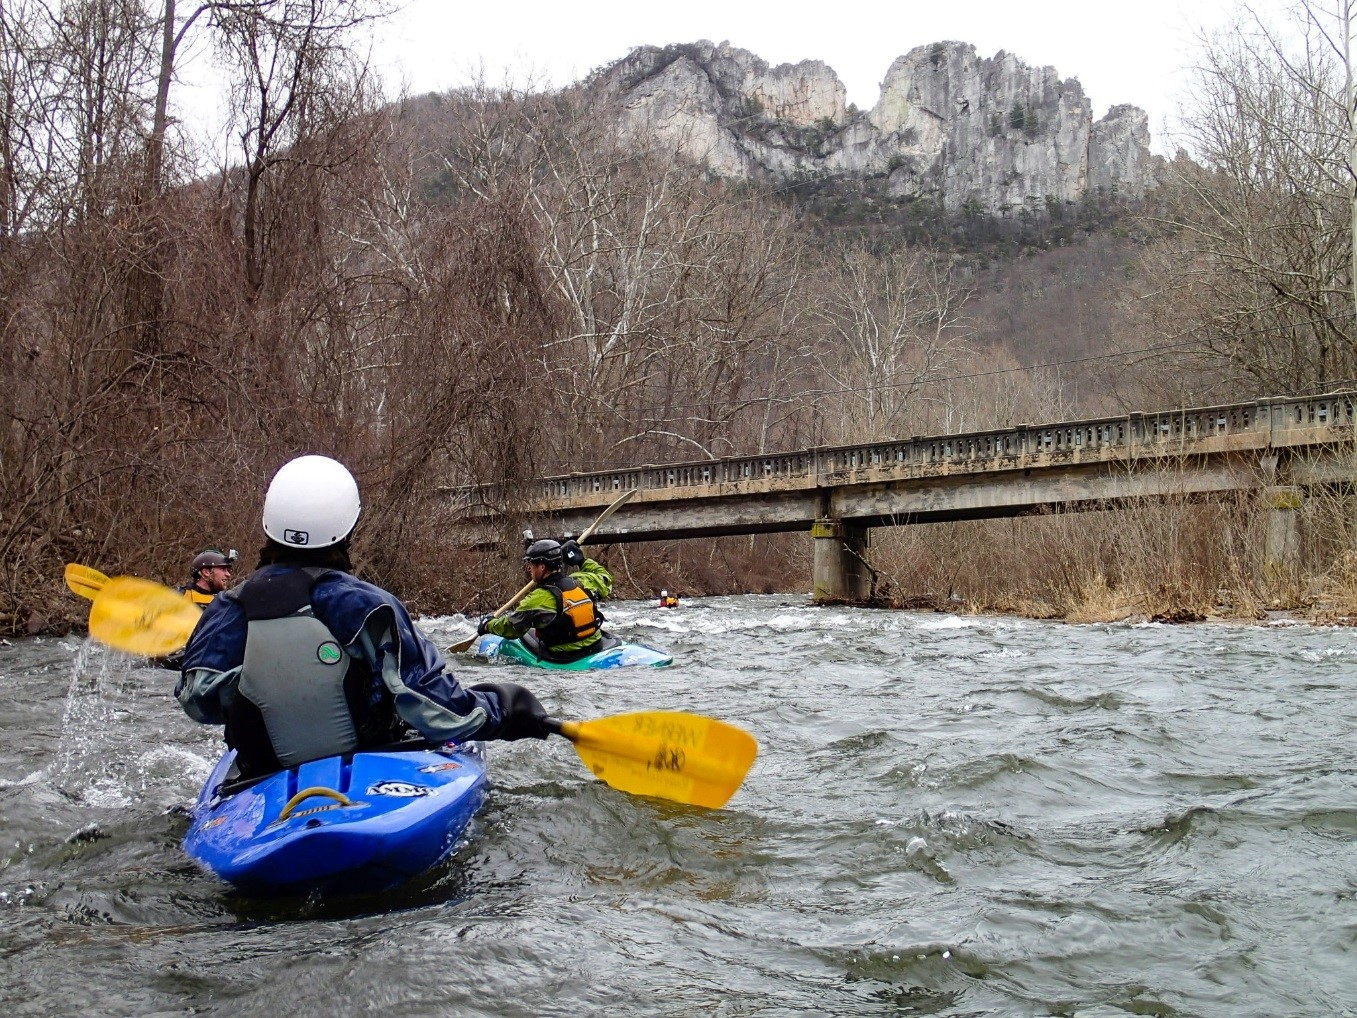 Seneca creek & Seneca rocks, Pendleton County, West Virginia. Dave Kersey, 2015.